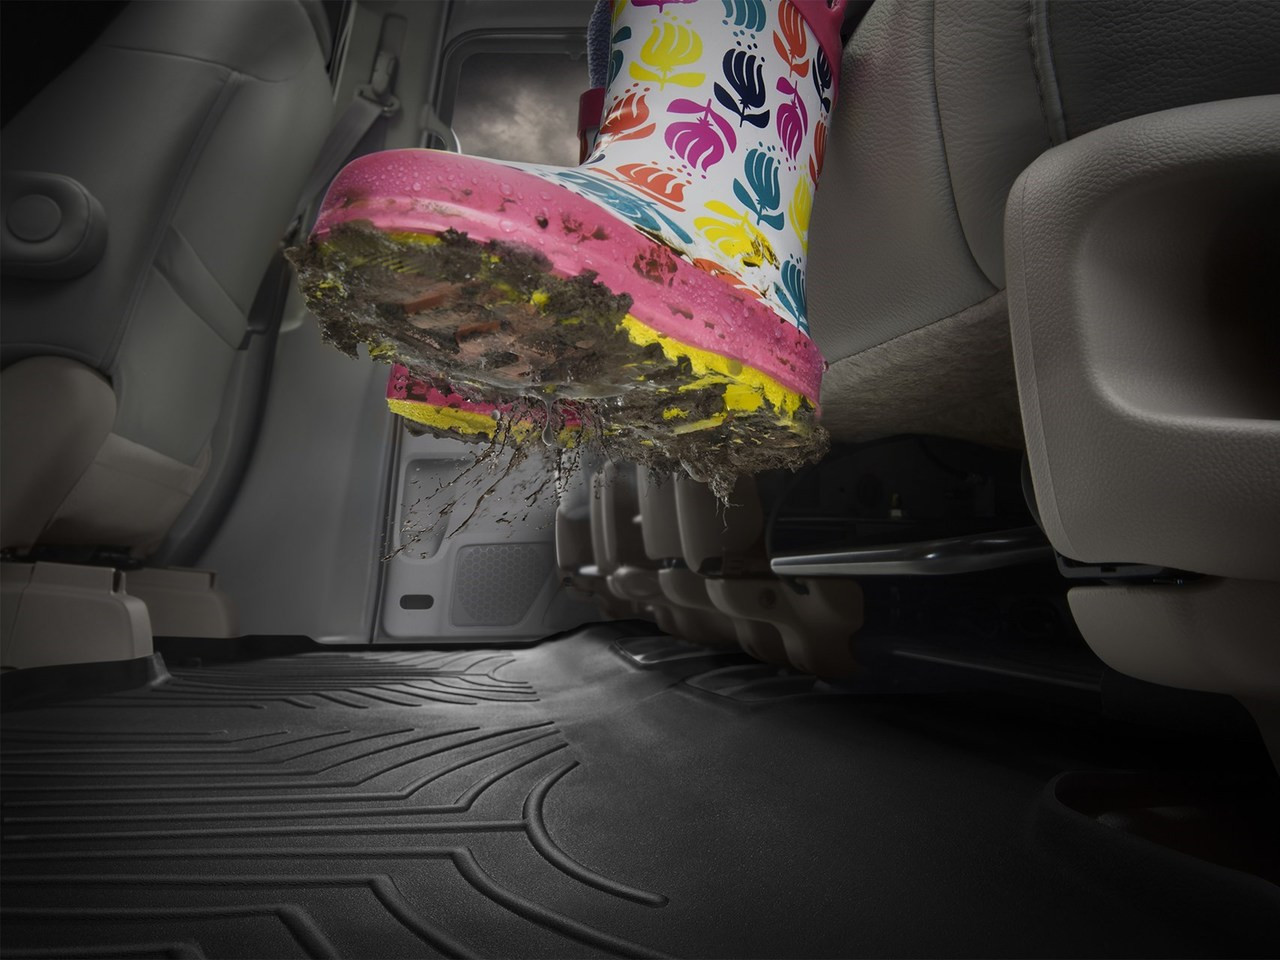 WeatherTech Custom Fit Rear FloorLiner for Ford F150 Super Cab Grey 460482